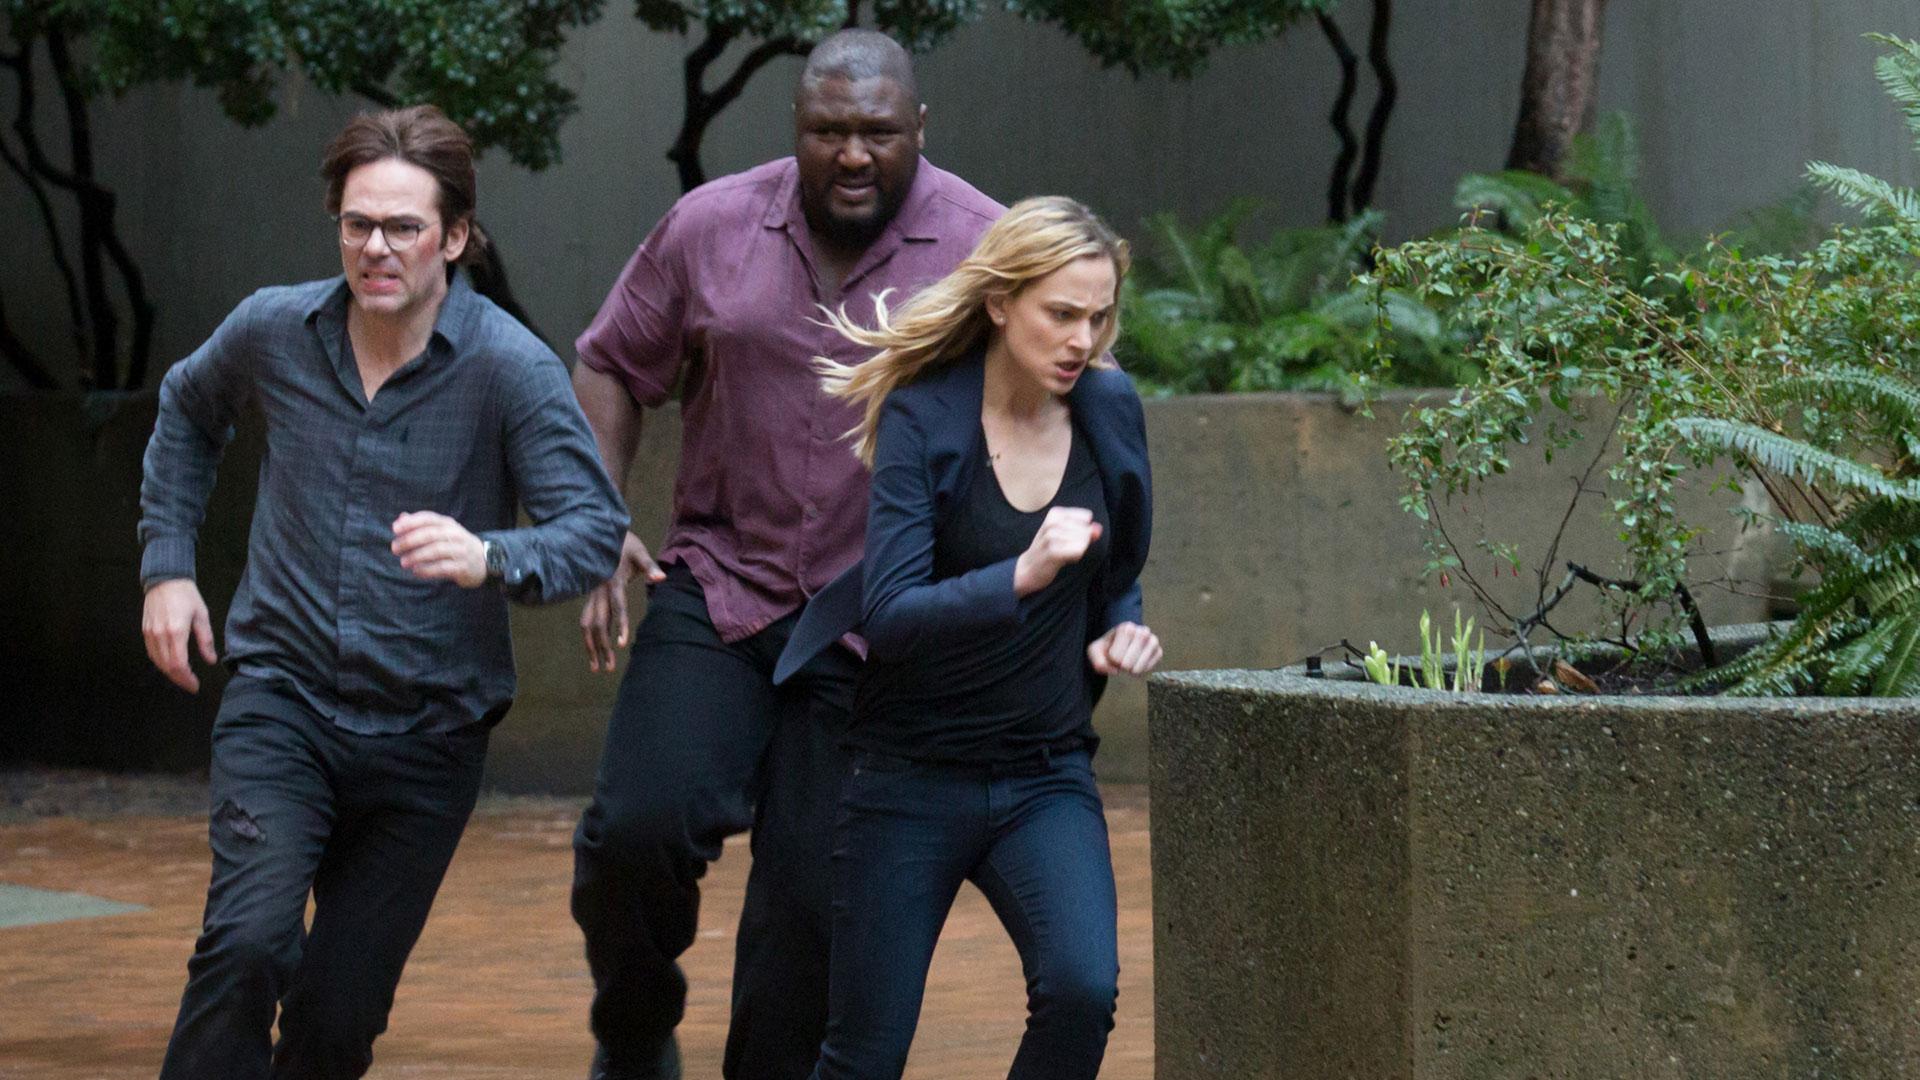 Mitch Morgan, Abraham Kenyatta, and Chloe Tousignant on the move.